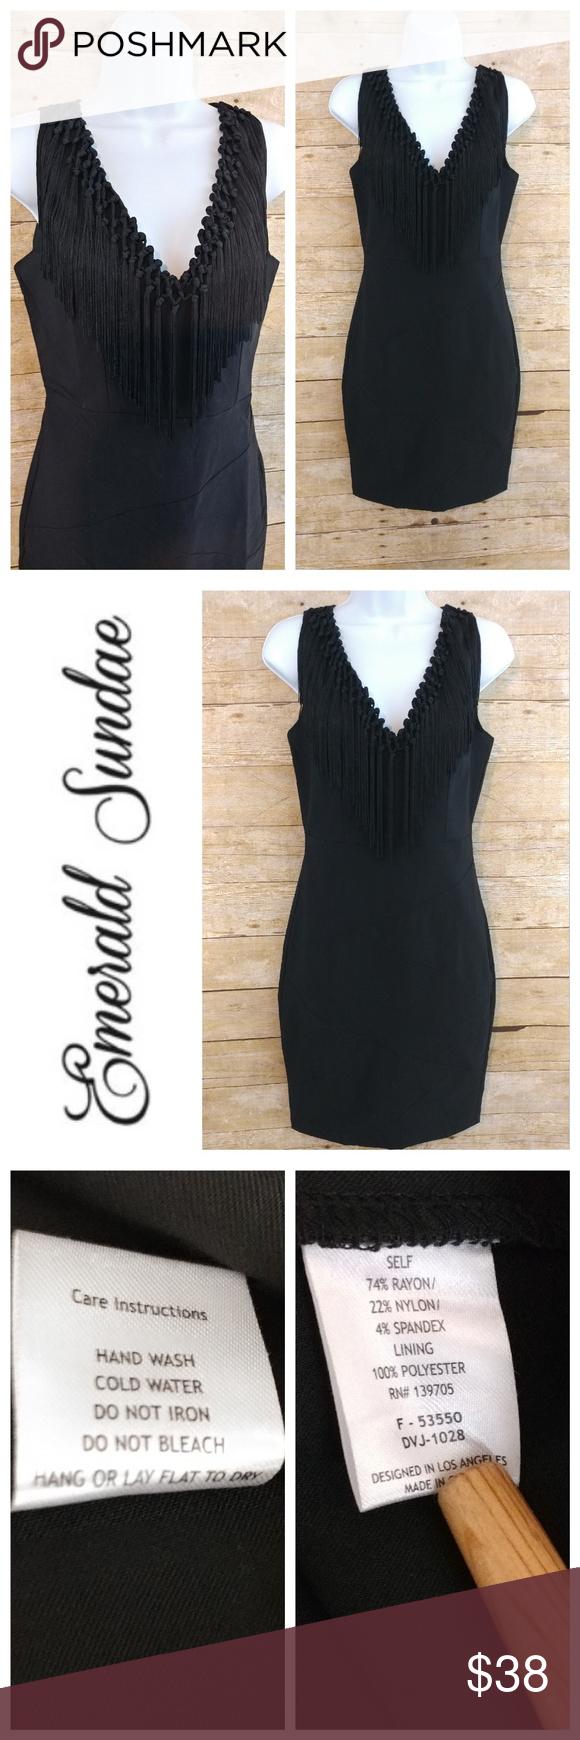 Emerald sundae black dress emeralds tassels and neckline